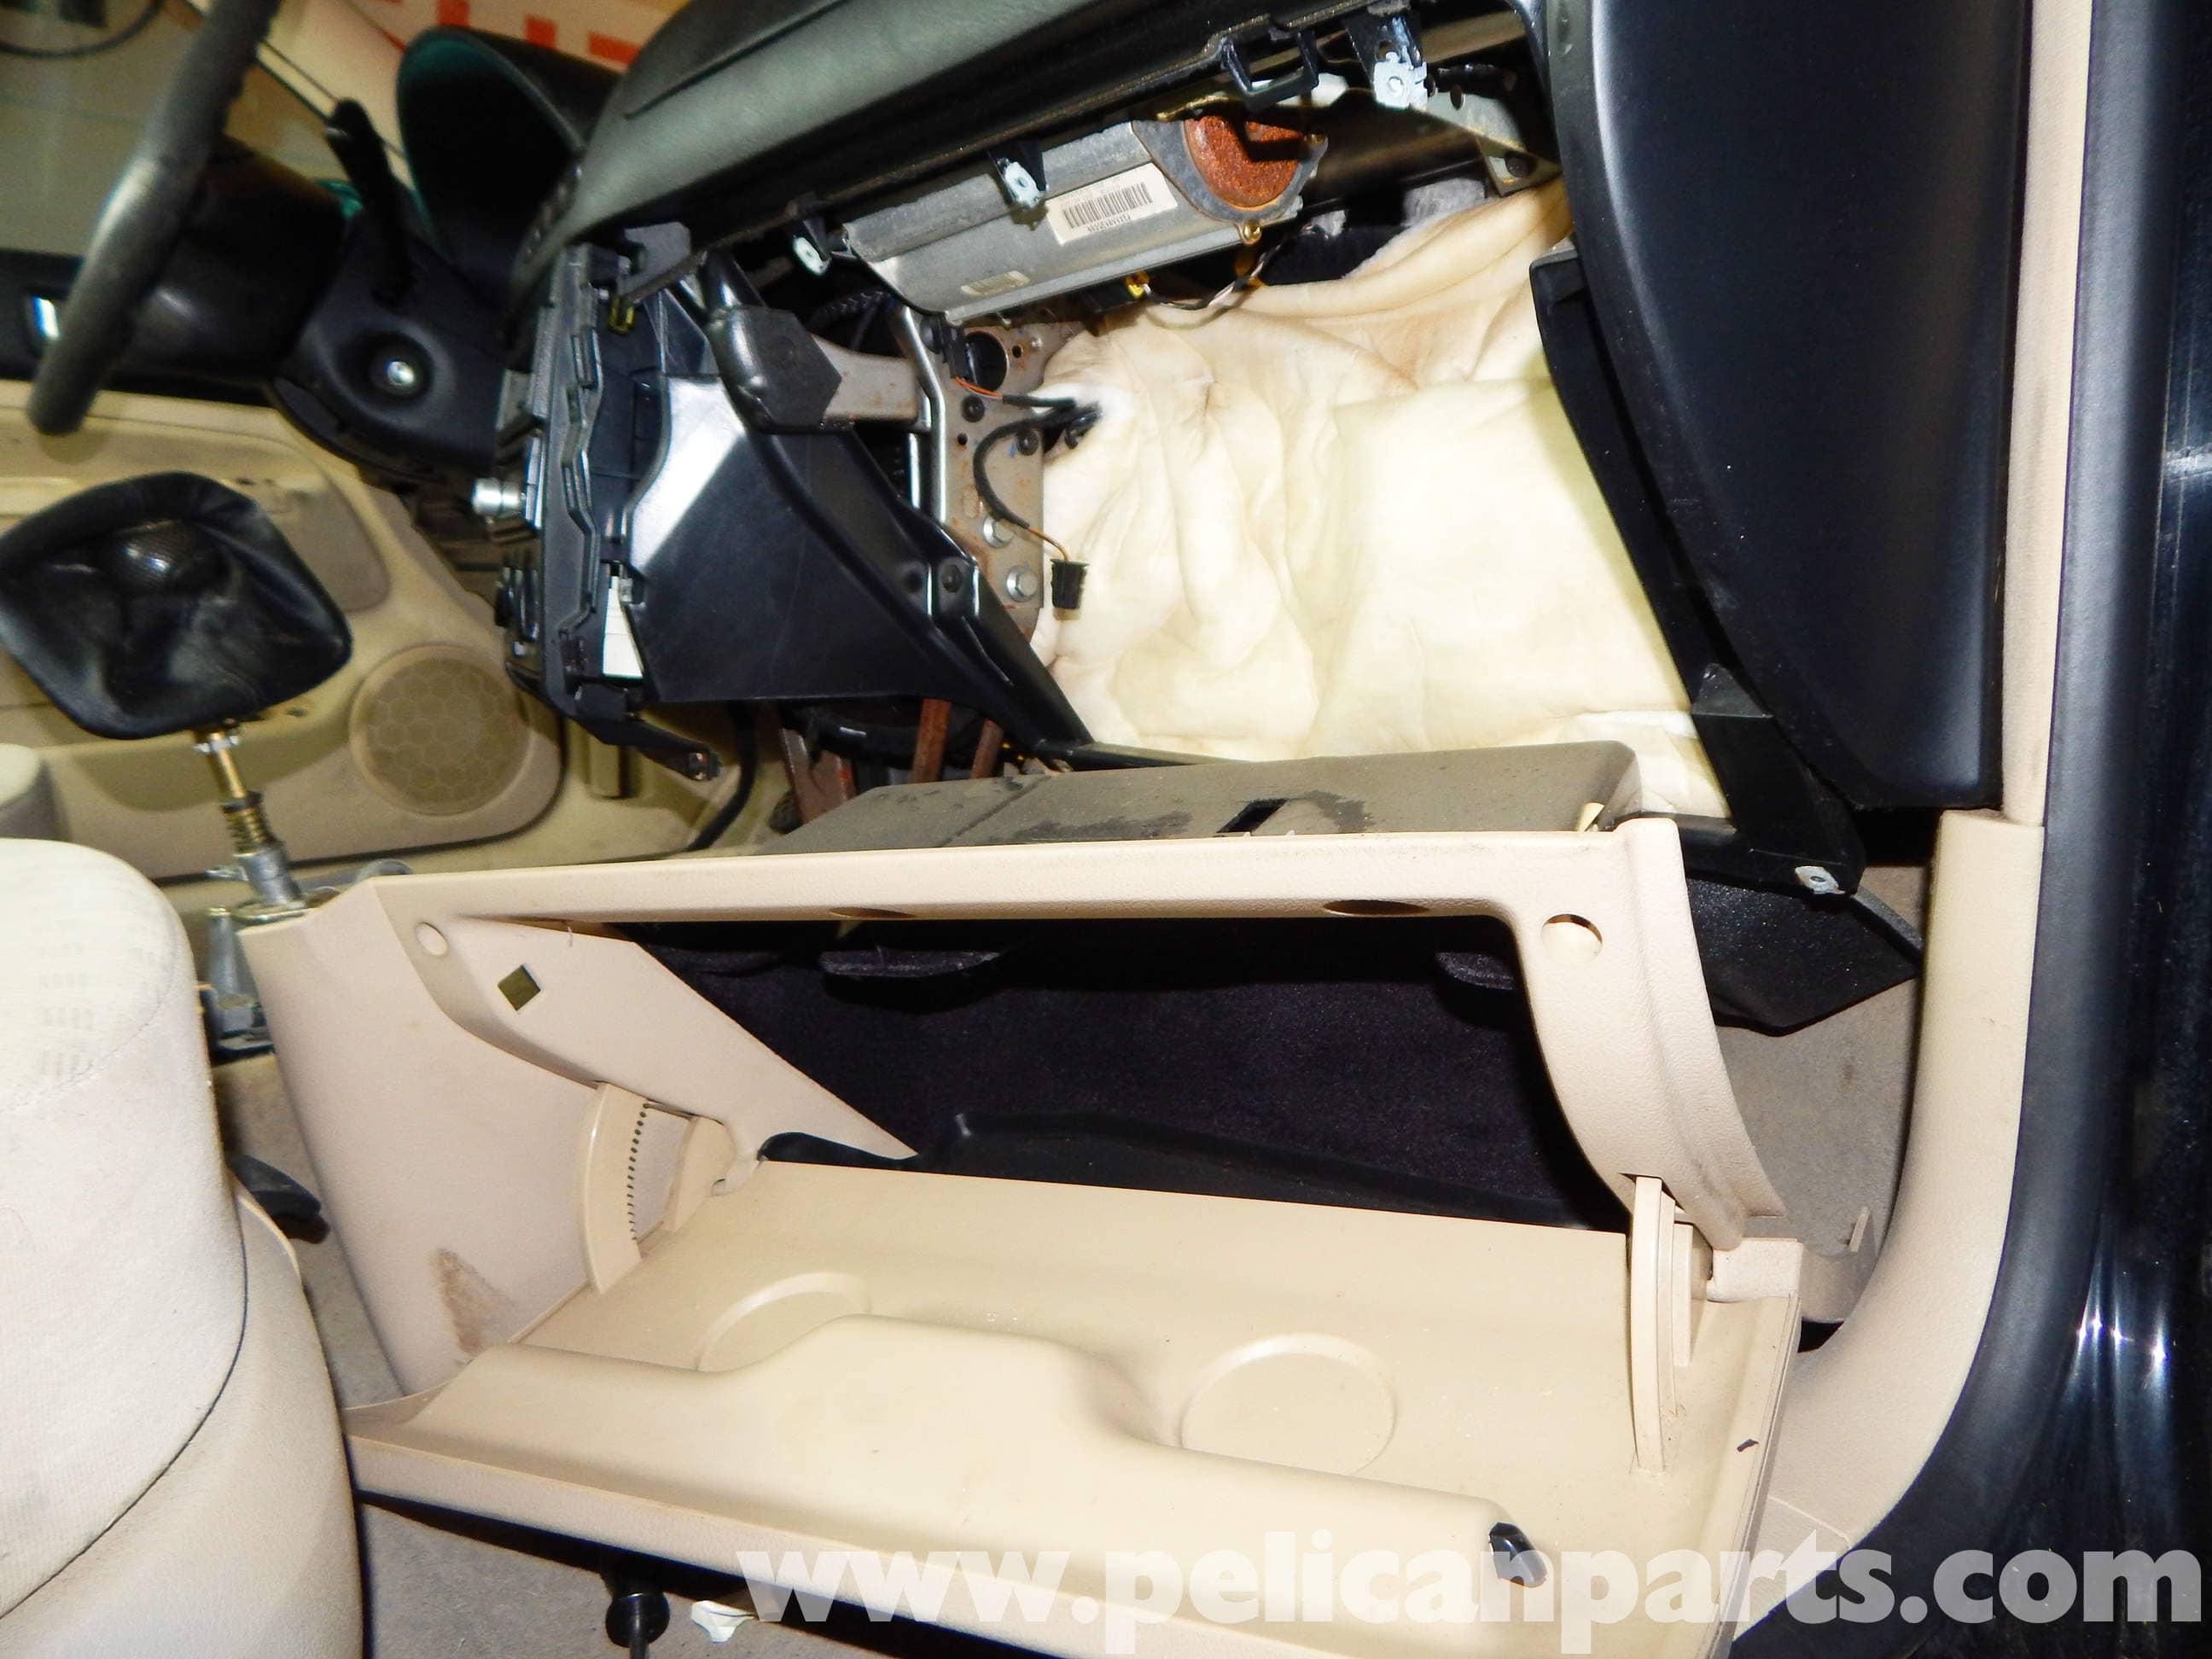 Volkswagen Jetta Mk4 Glove Box Removal | Jetta Mk4 2 0L (1998-2005